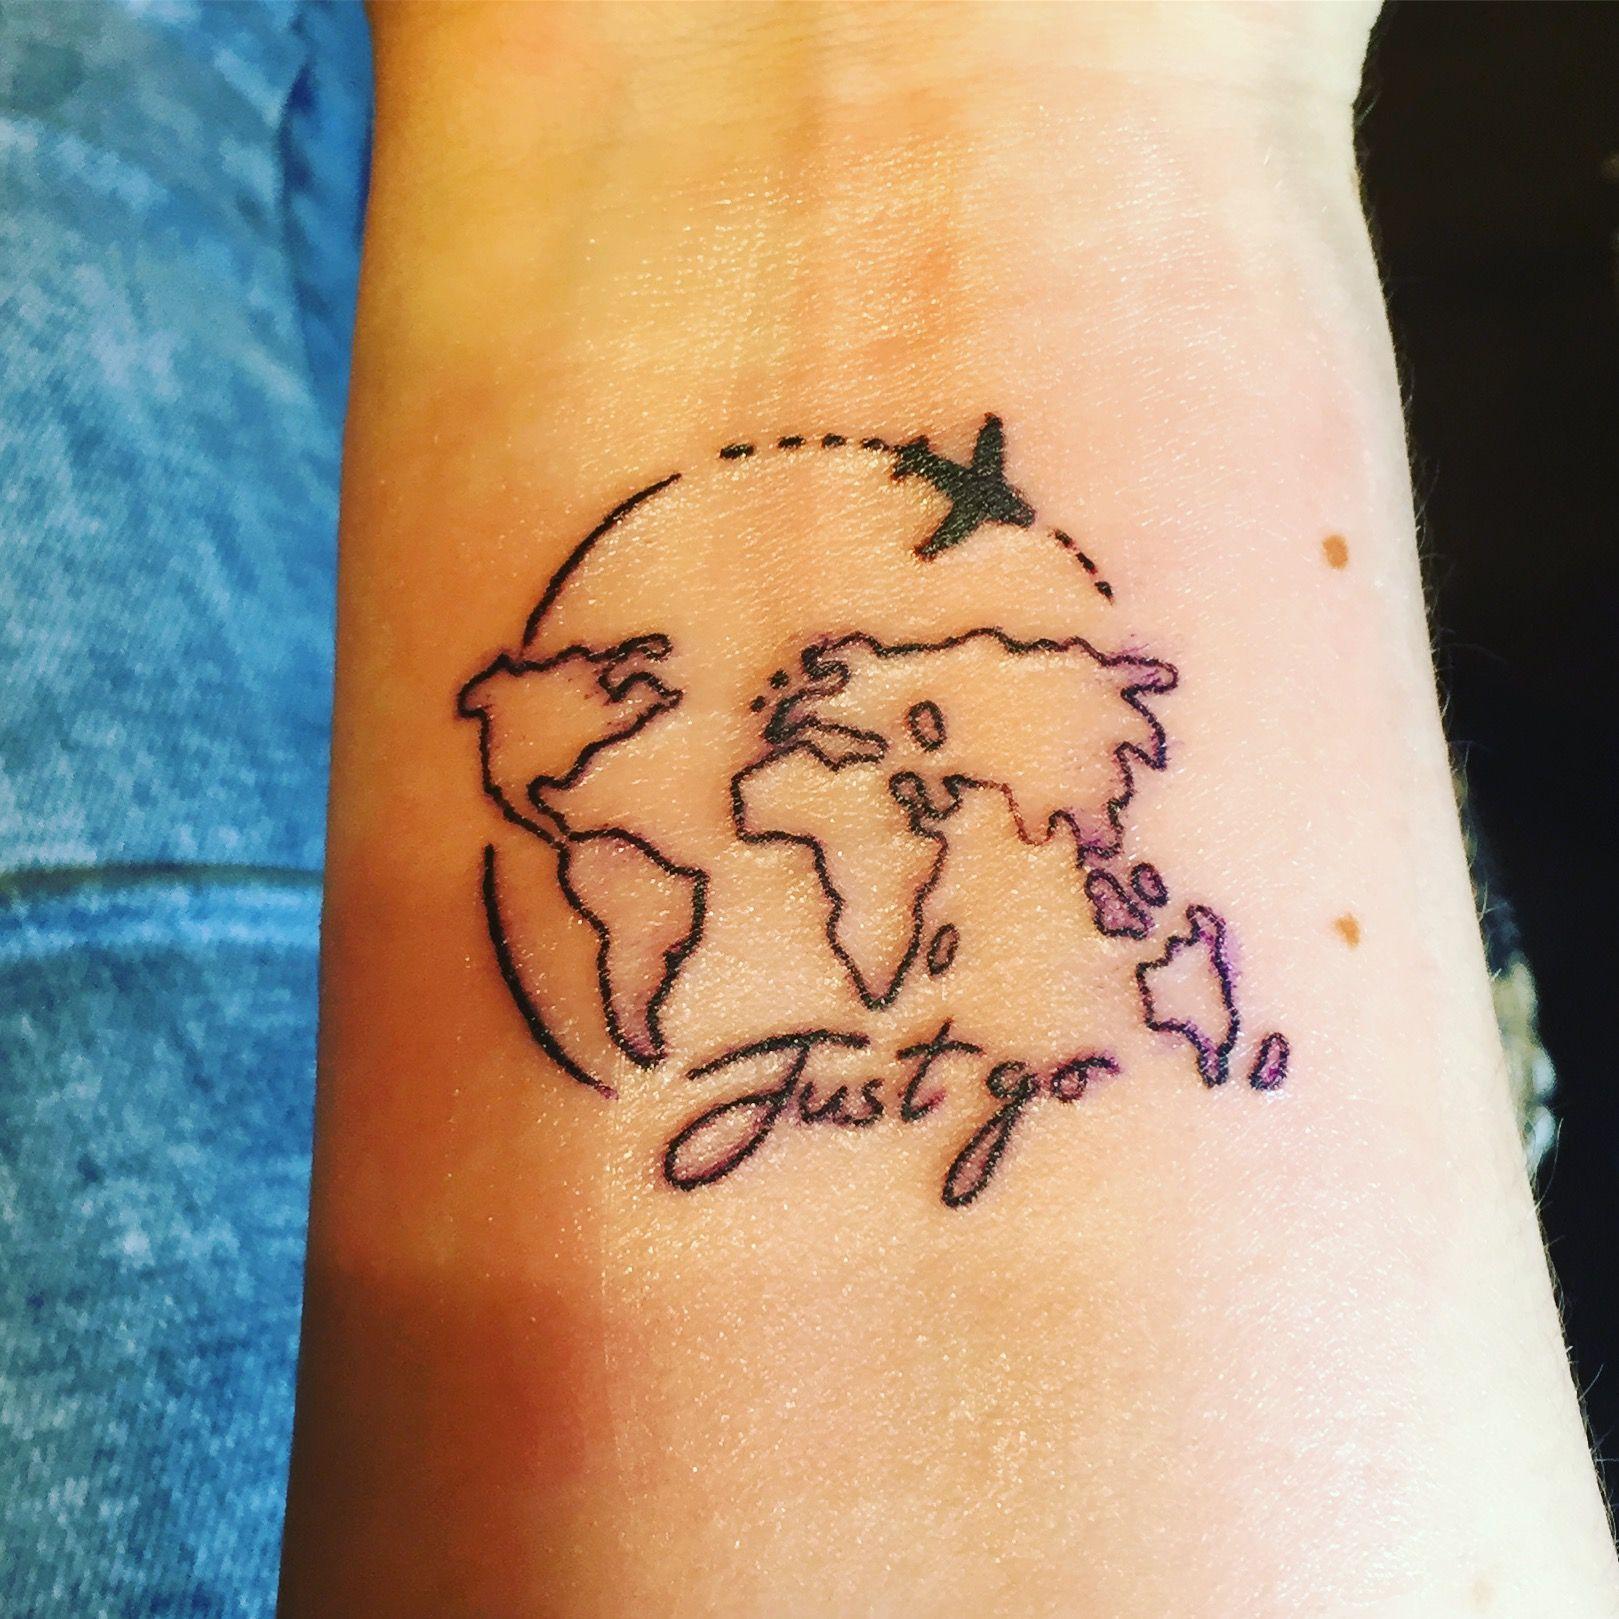 First tattoo travel traveltattoo inked airplane